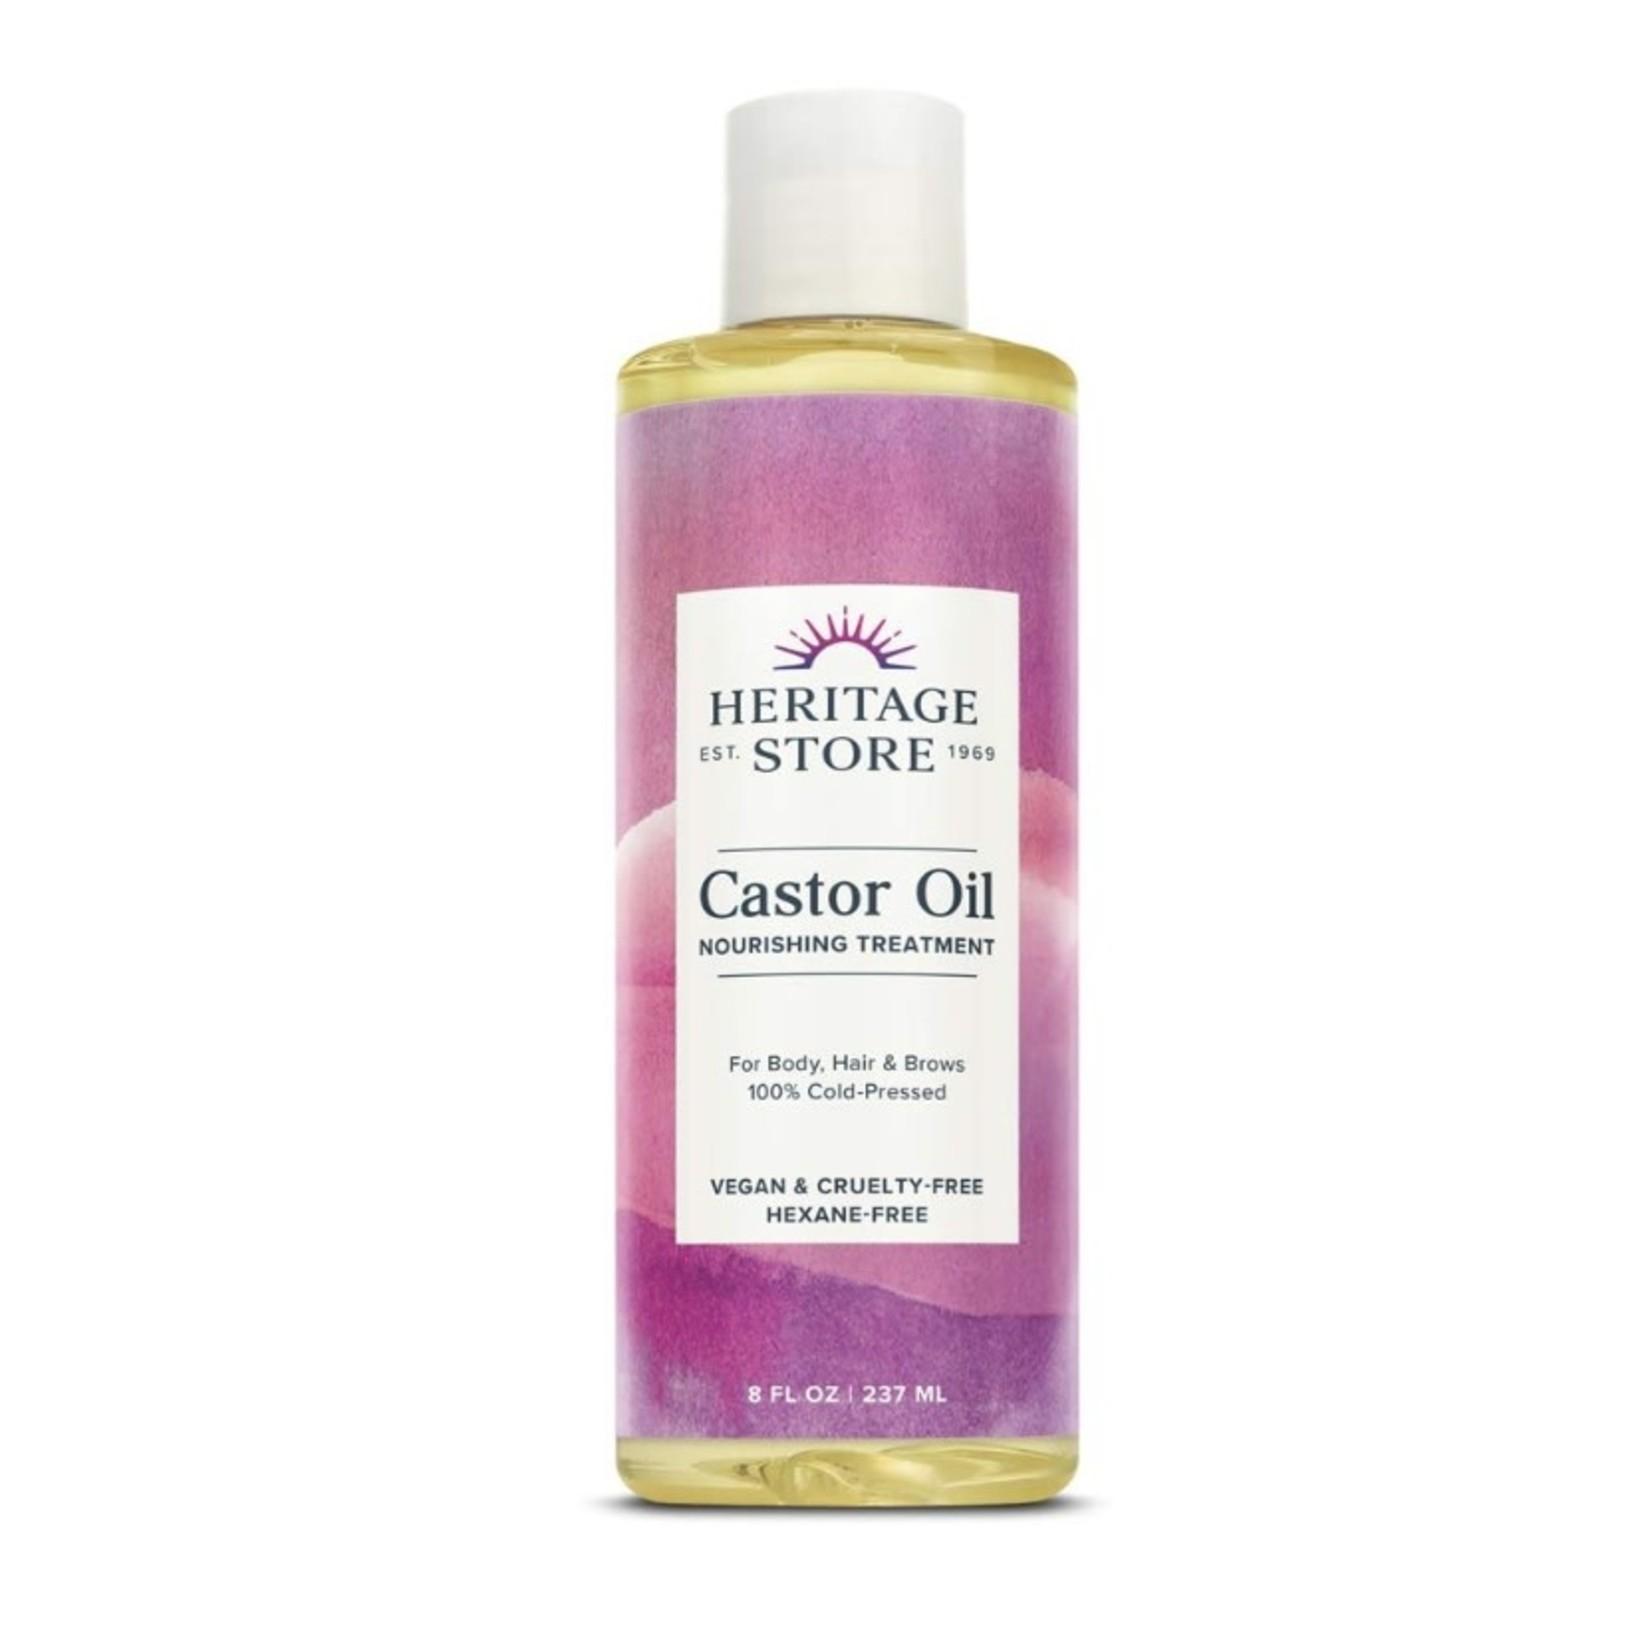 Heritage Store Heritage Store Castor Oil 8oz